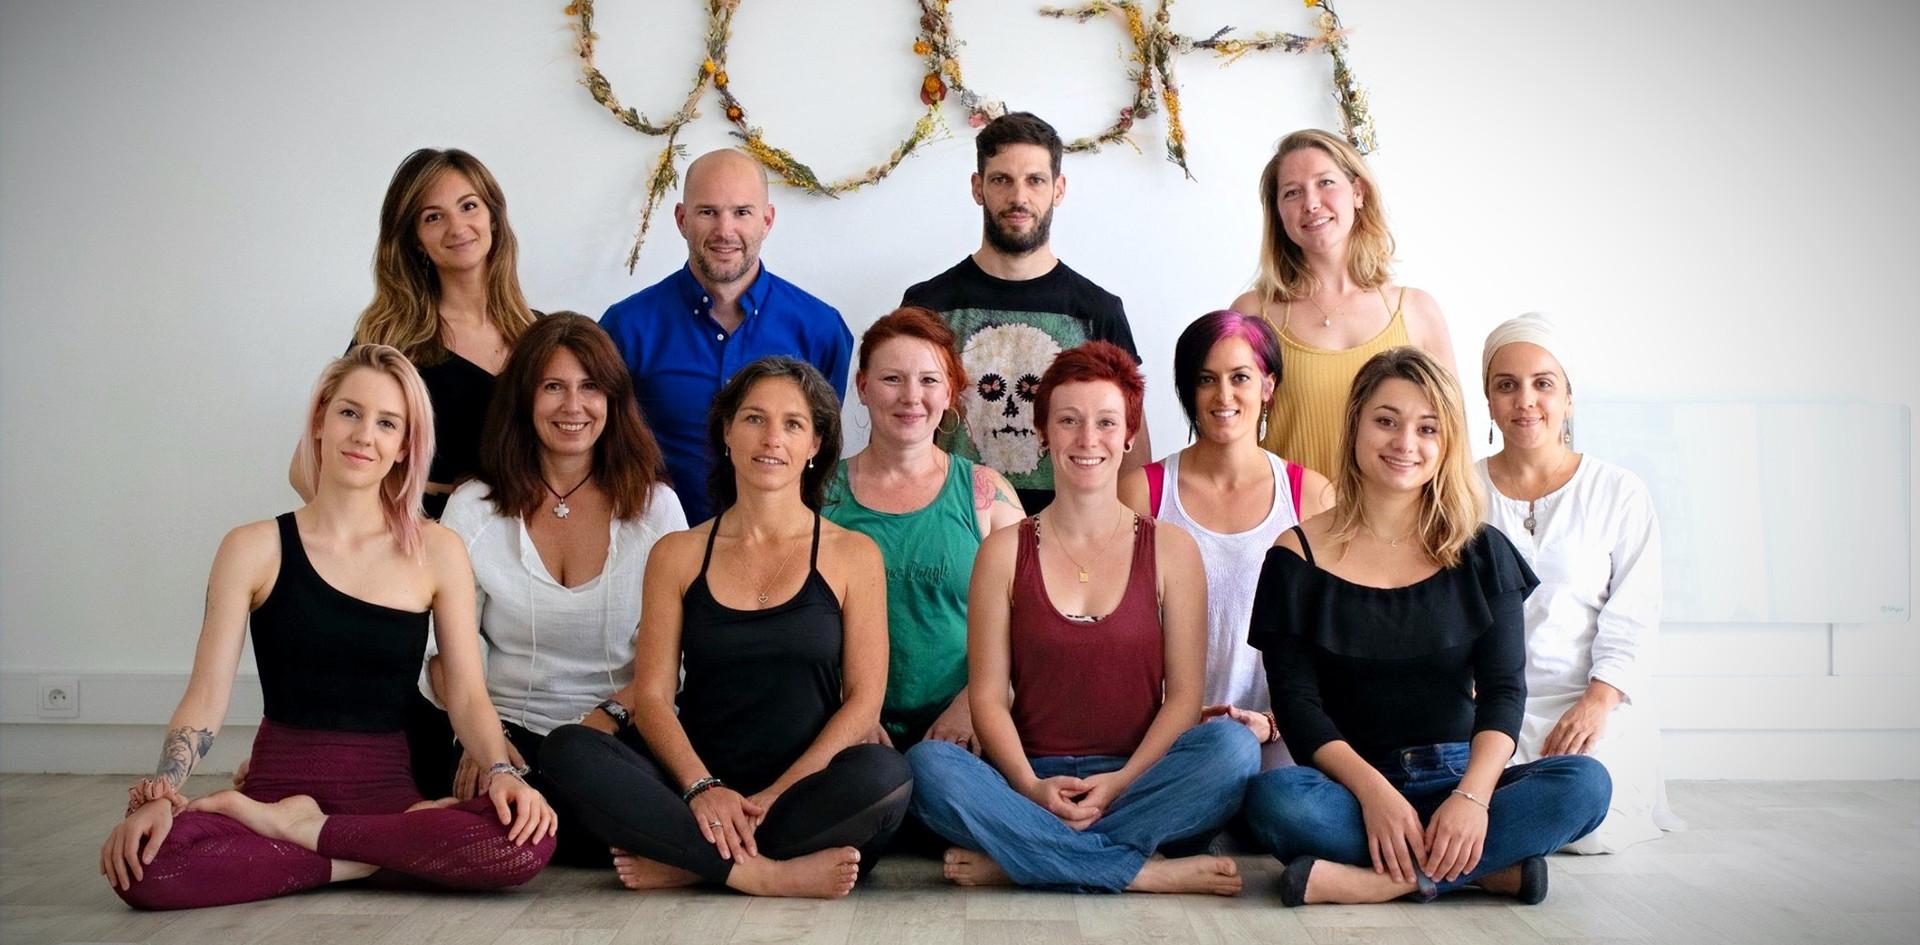 L'équipe de Yoga Sana